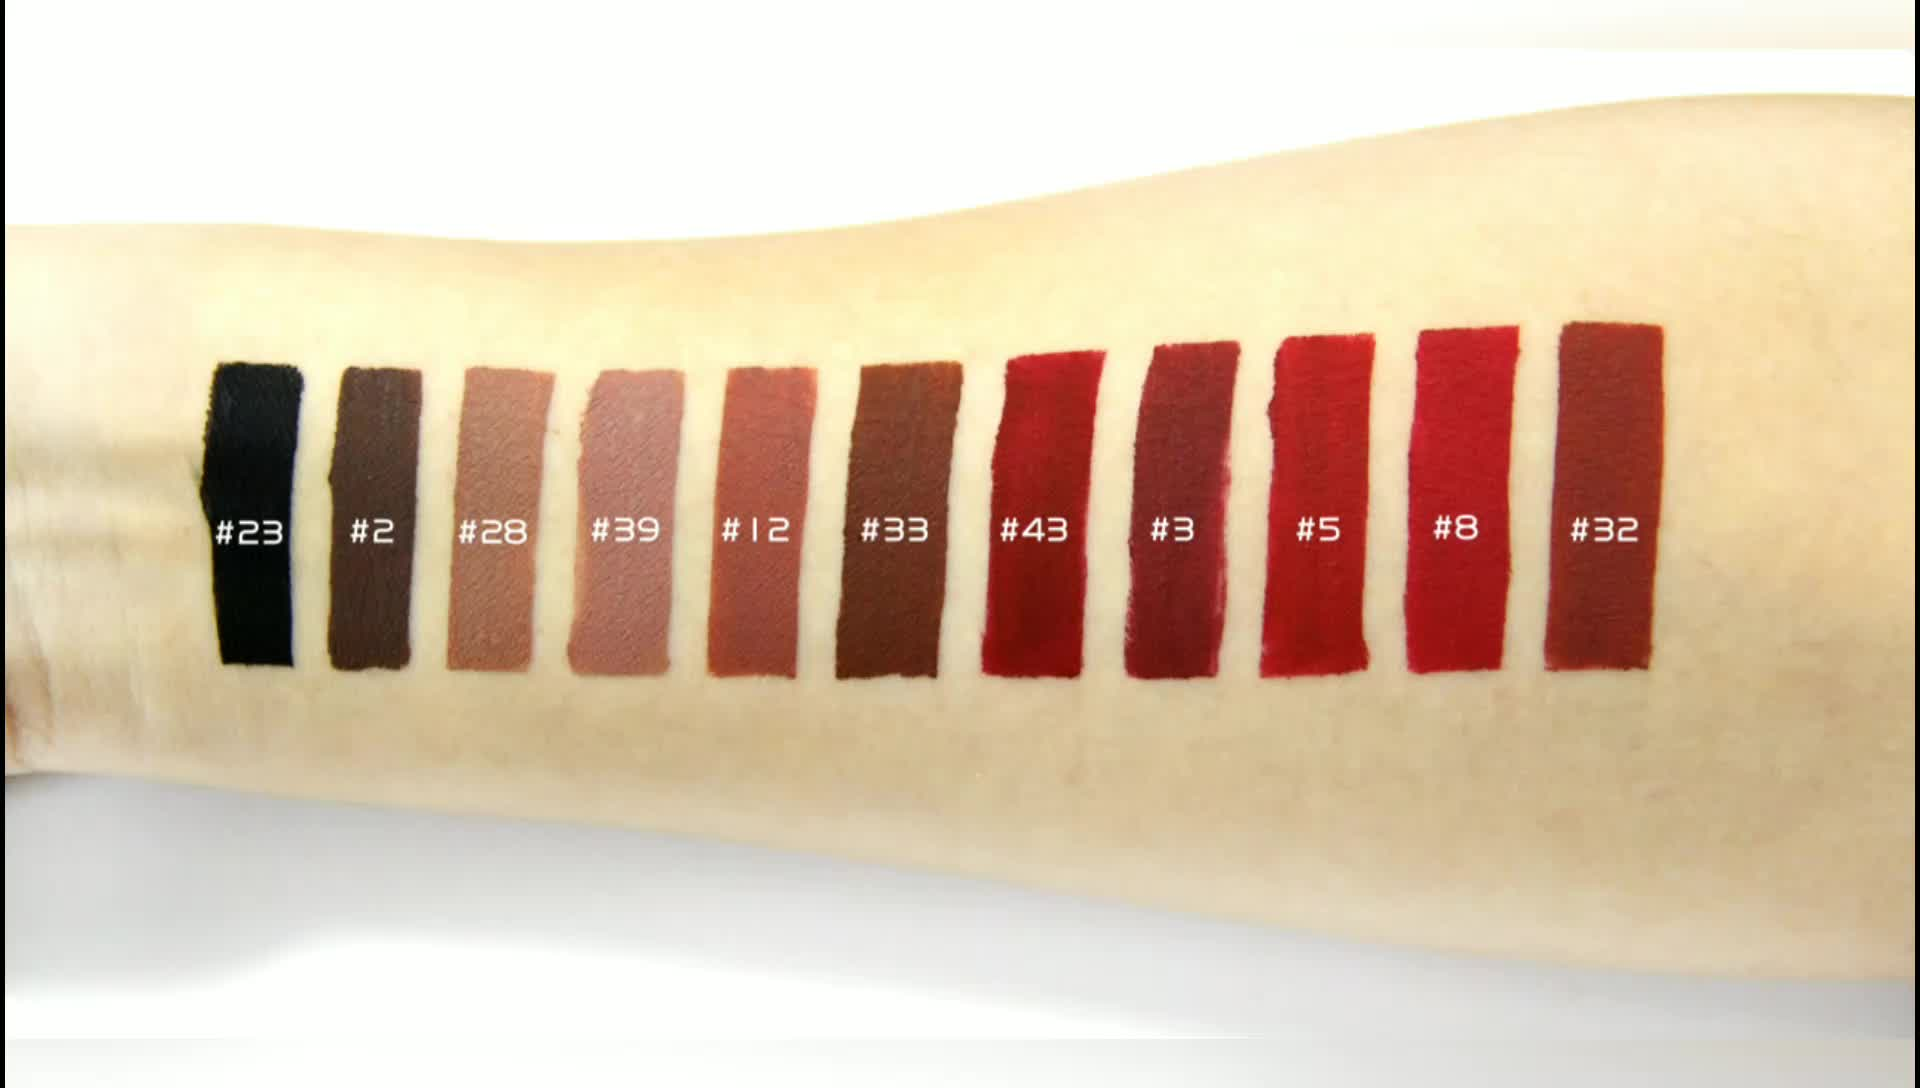 wholesale plain no label accept private label matte waterproof liquid lipstick